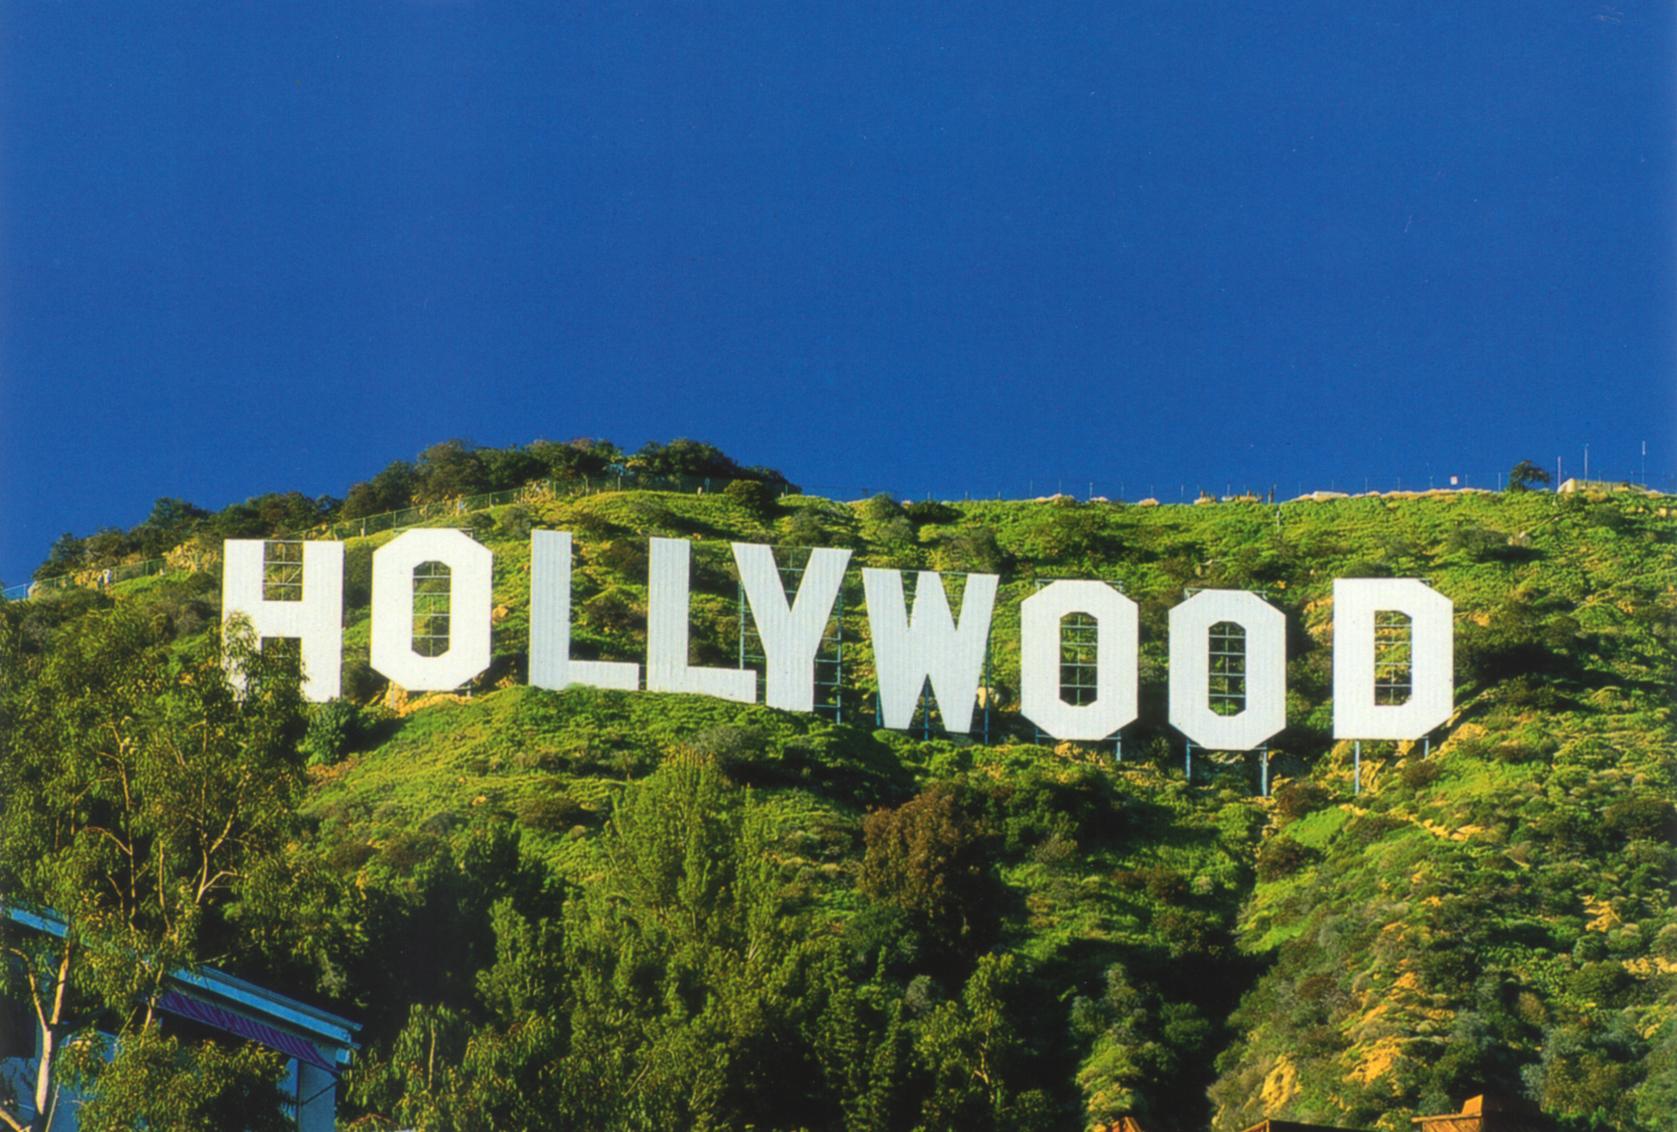 Hollywood Hd Wallpaper Hollywood Movie Gallery 1677x1132